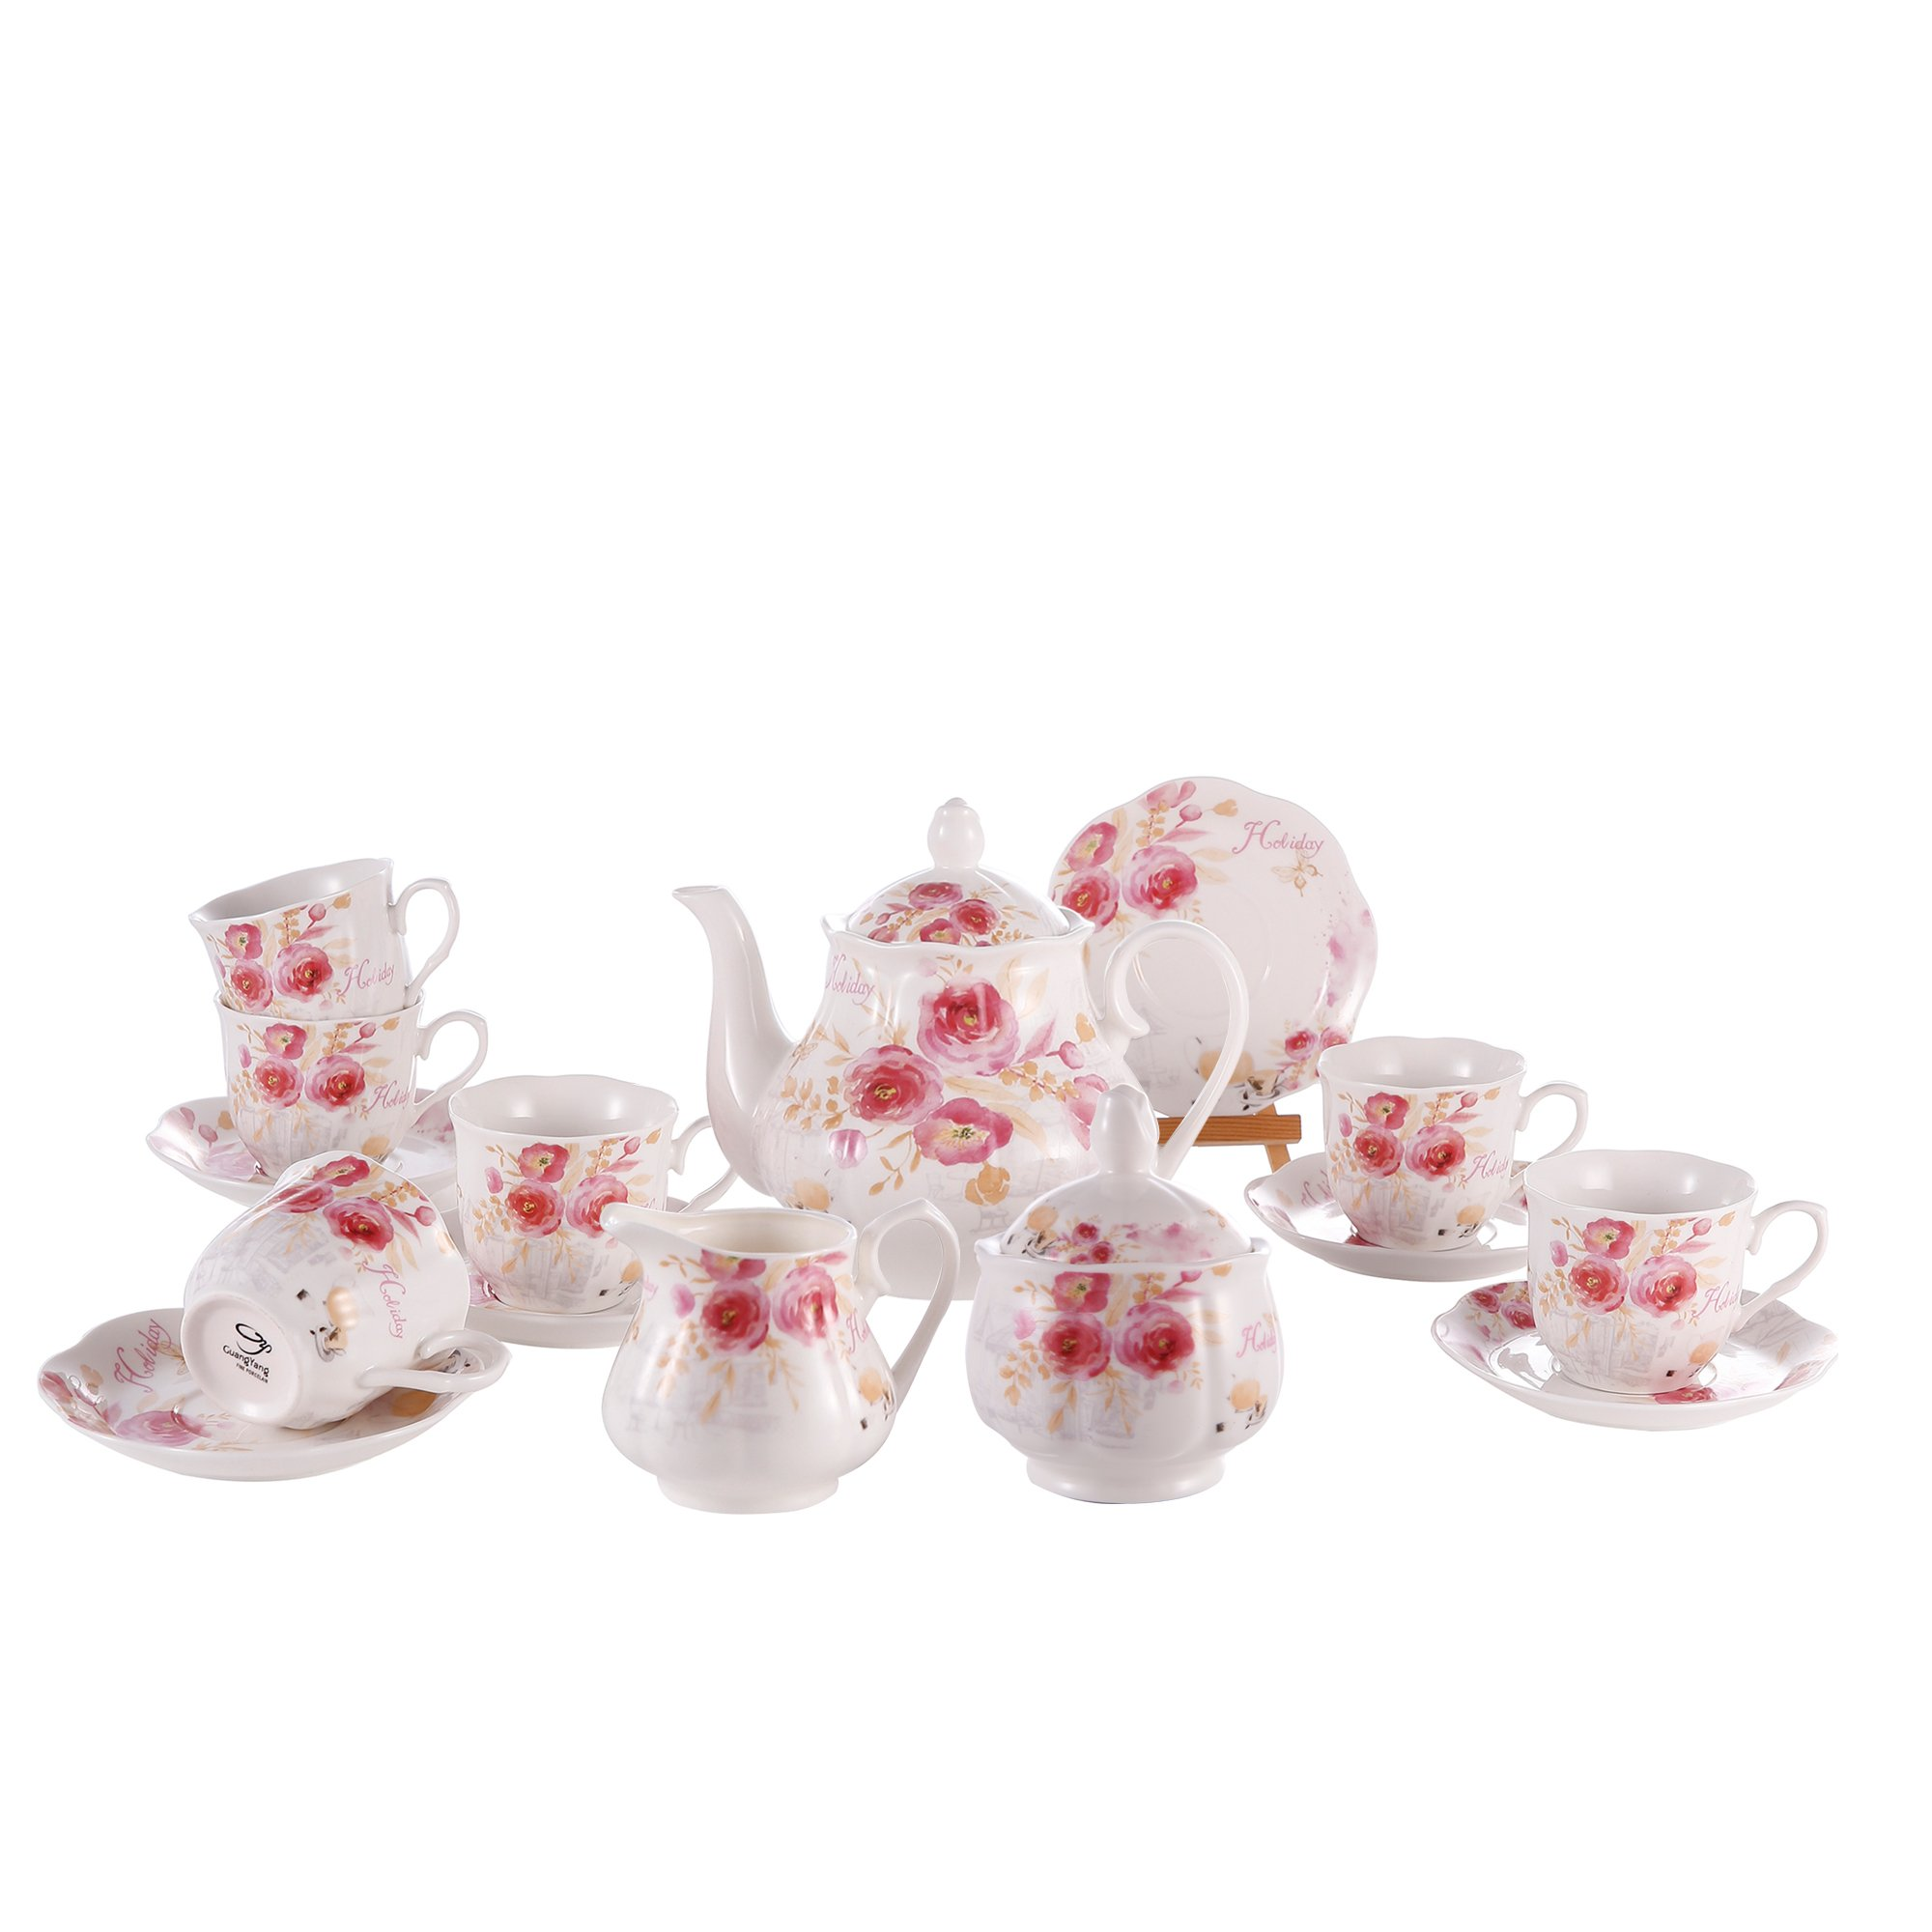 GuangYang Tea Set Service Sugar Tank Creamer Teapot and 6 Cups and Saucers Sets Rose Painting Pattern Porcelain Bone China Coffee set 15 PCS